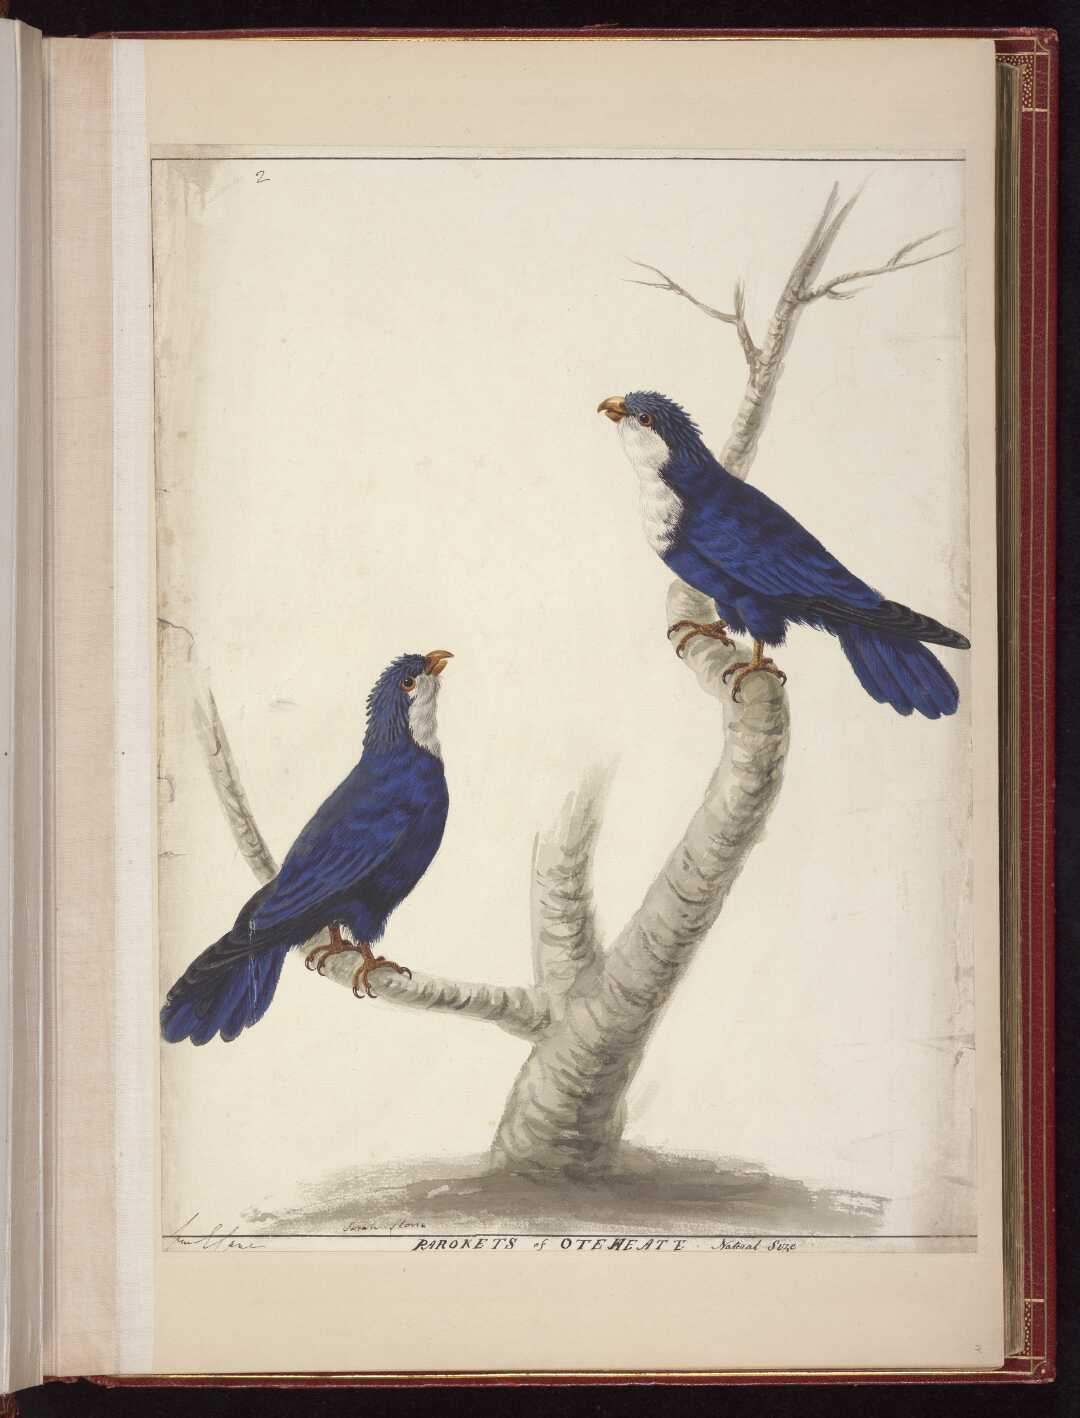 Parokets of Oteheate Natural Size,ca 1785